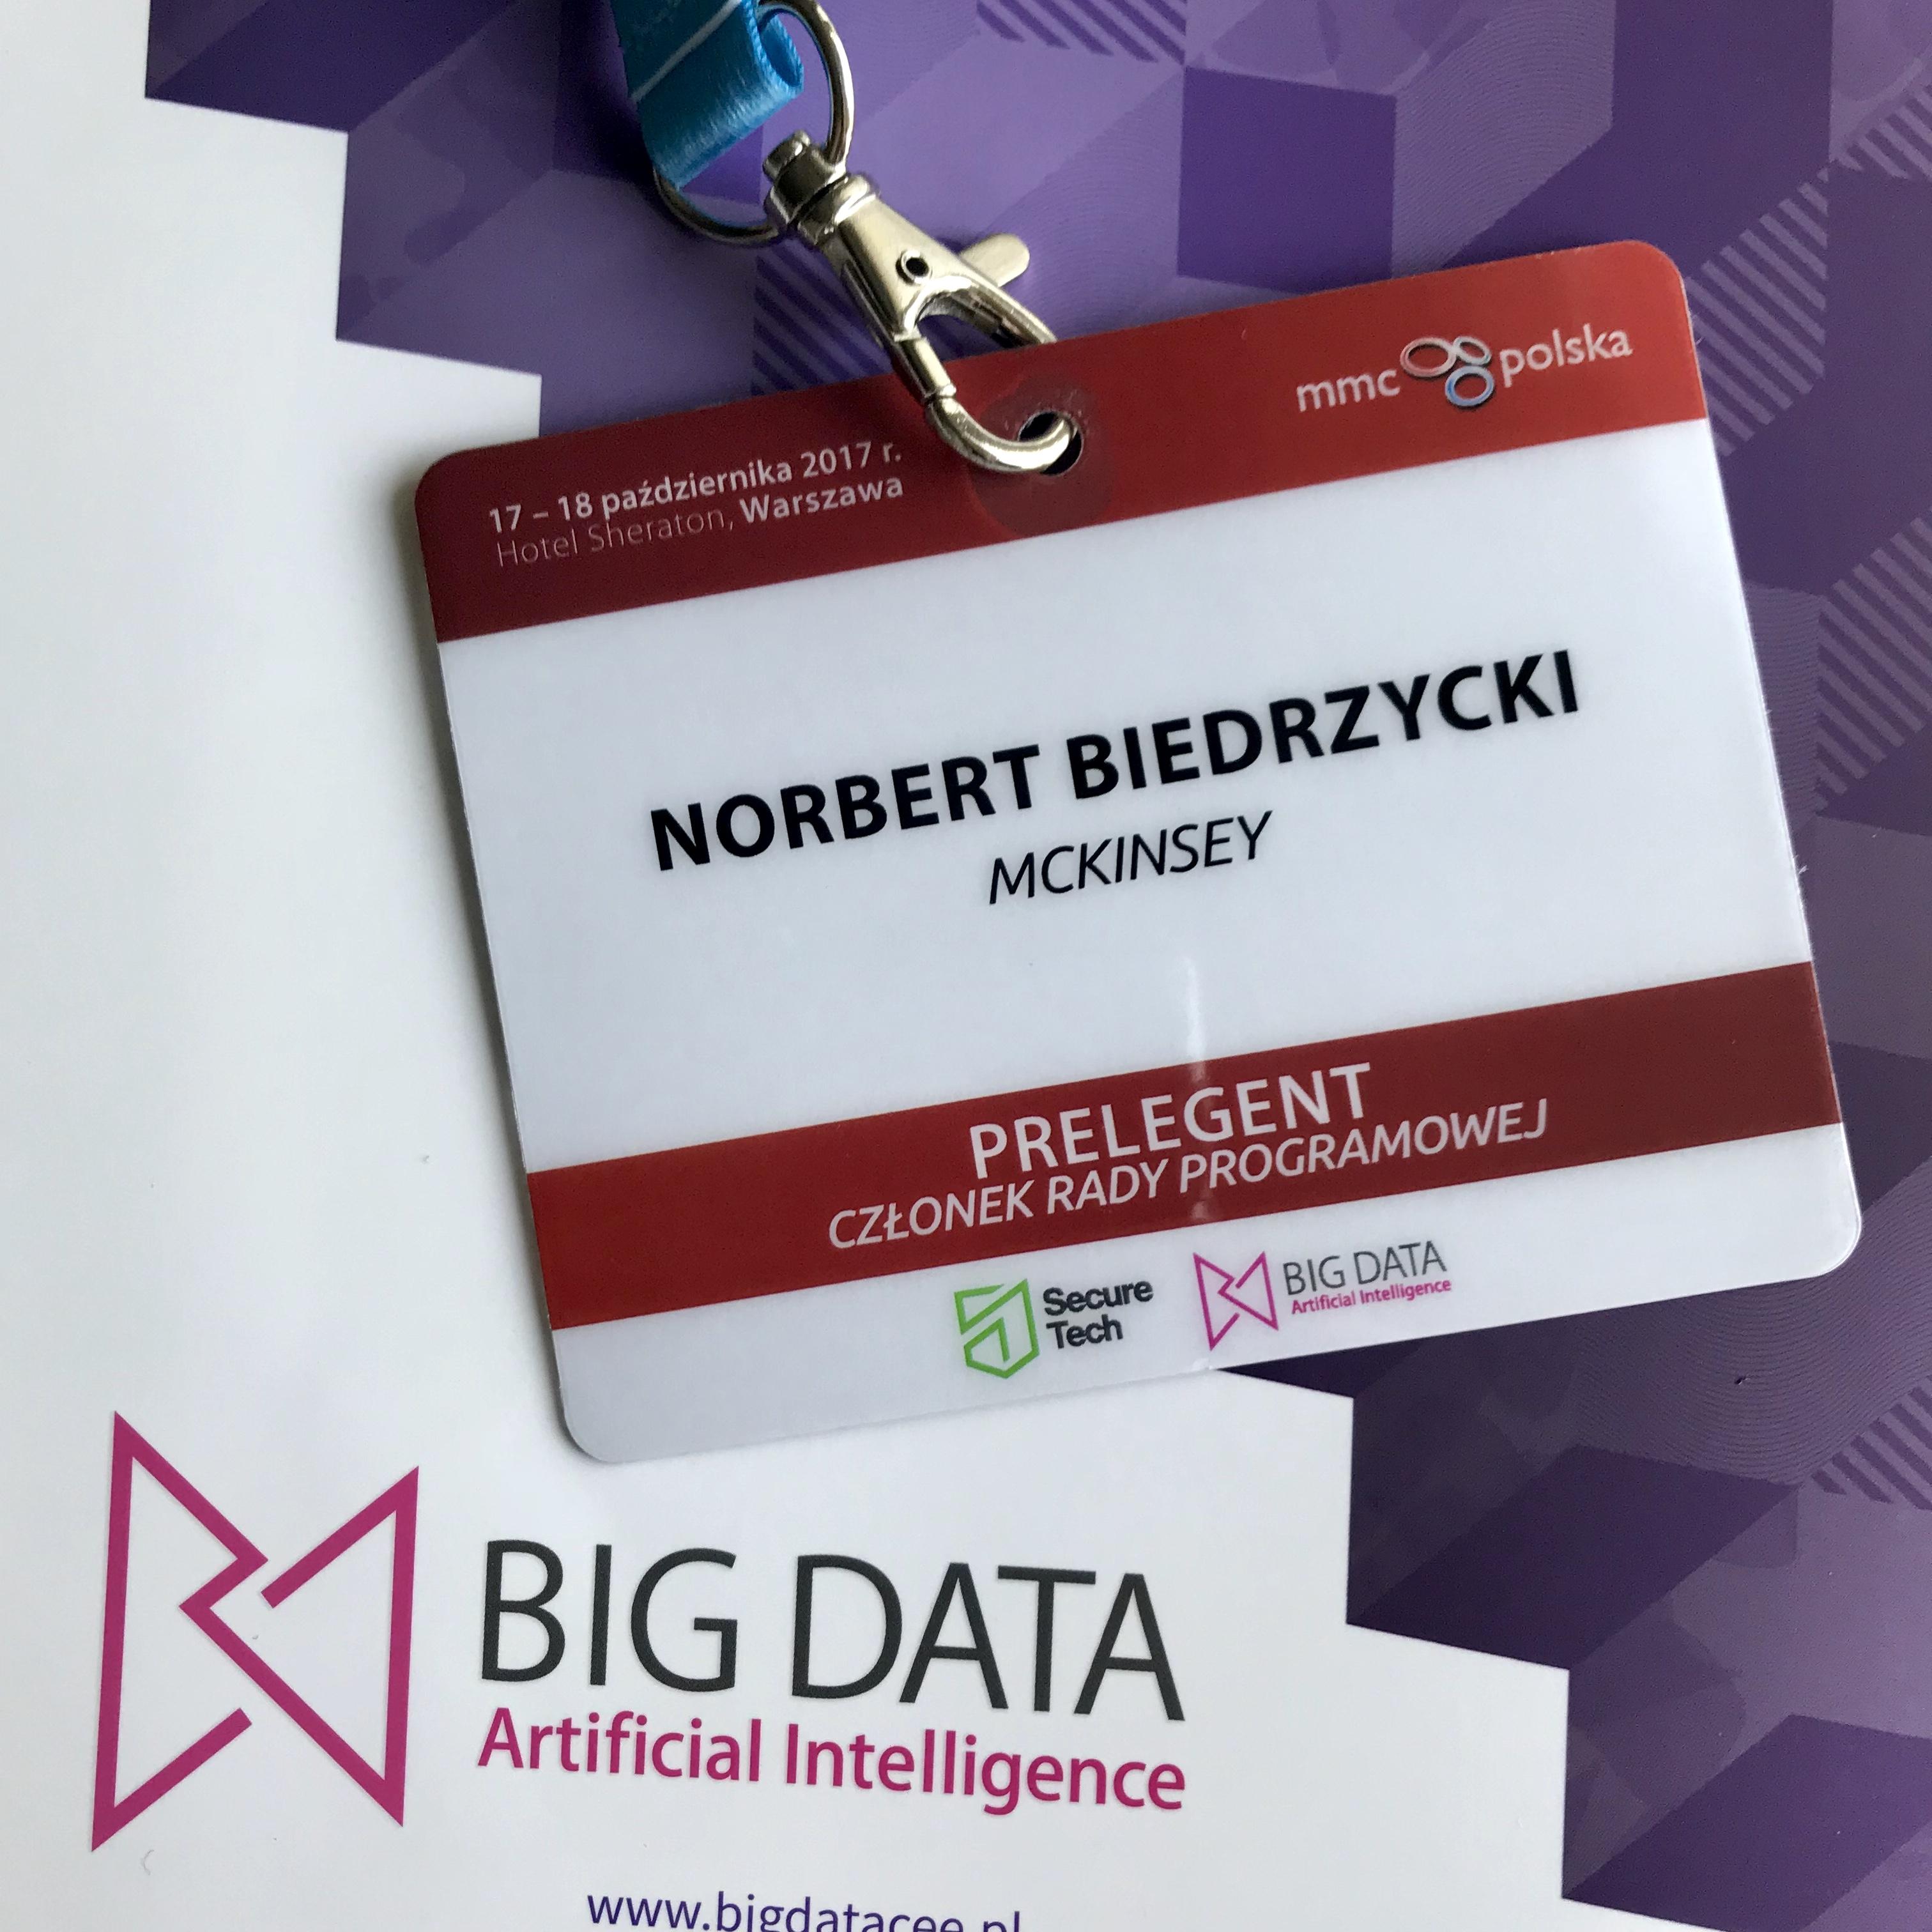 BigData AI conference Norbert Biedrzycki 2